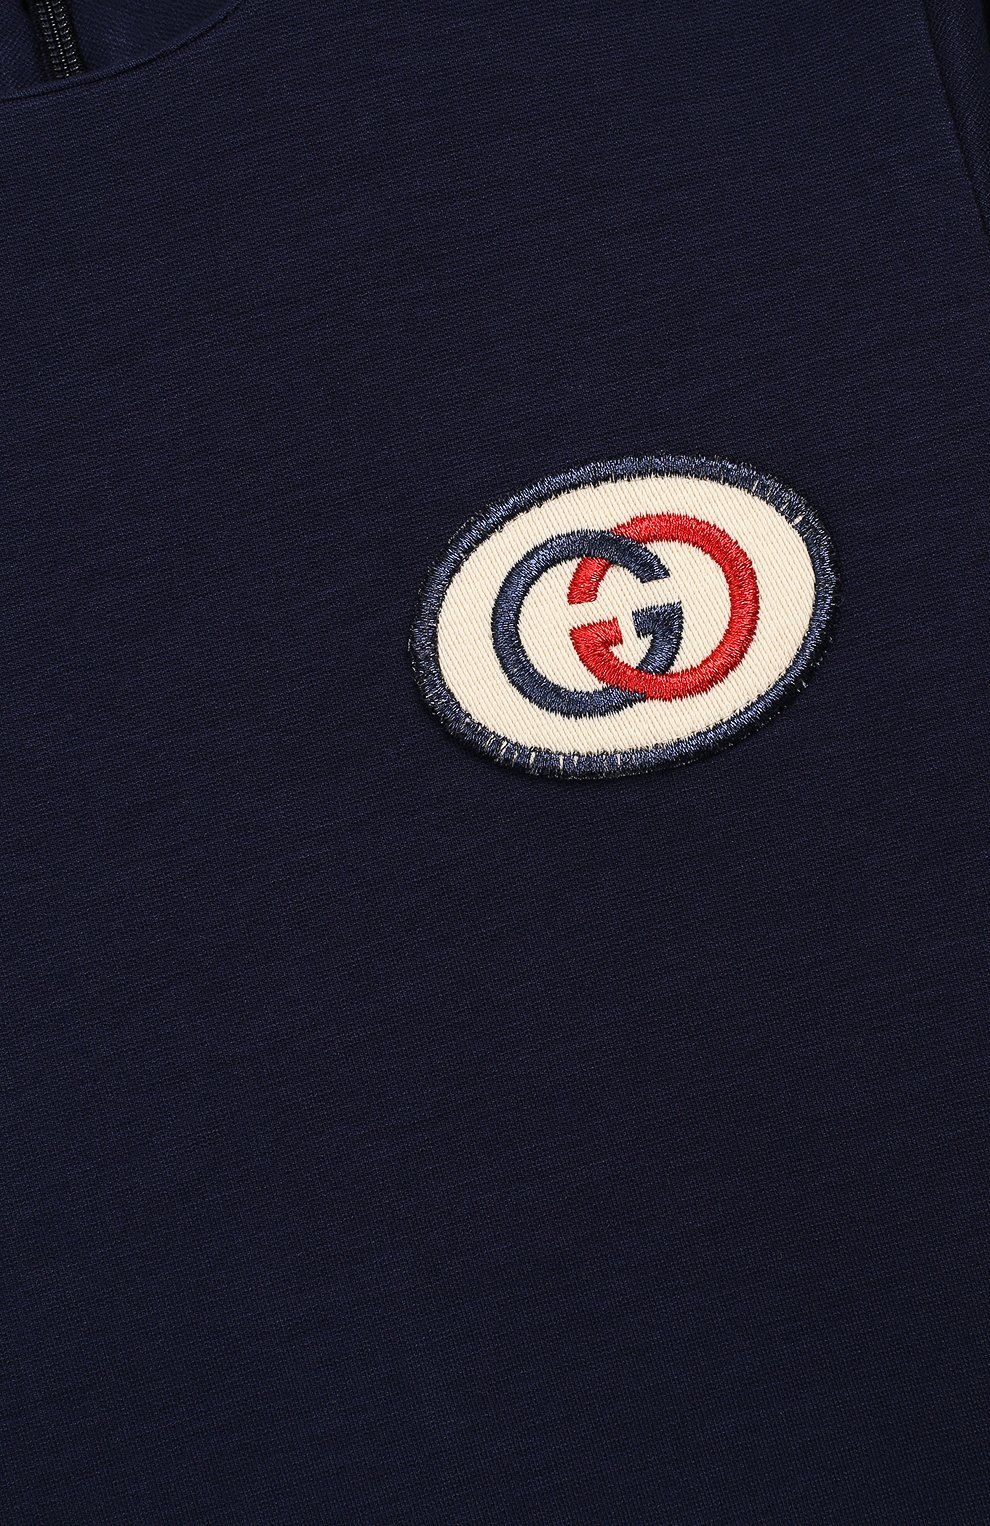 Детский футболка из вискозы GUCCI синего цвета, арт. 578063/XJBEB | Фото 3